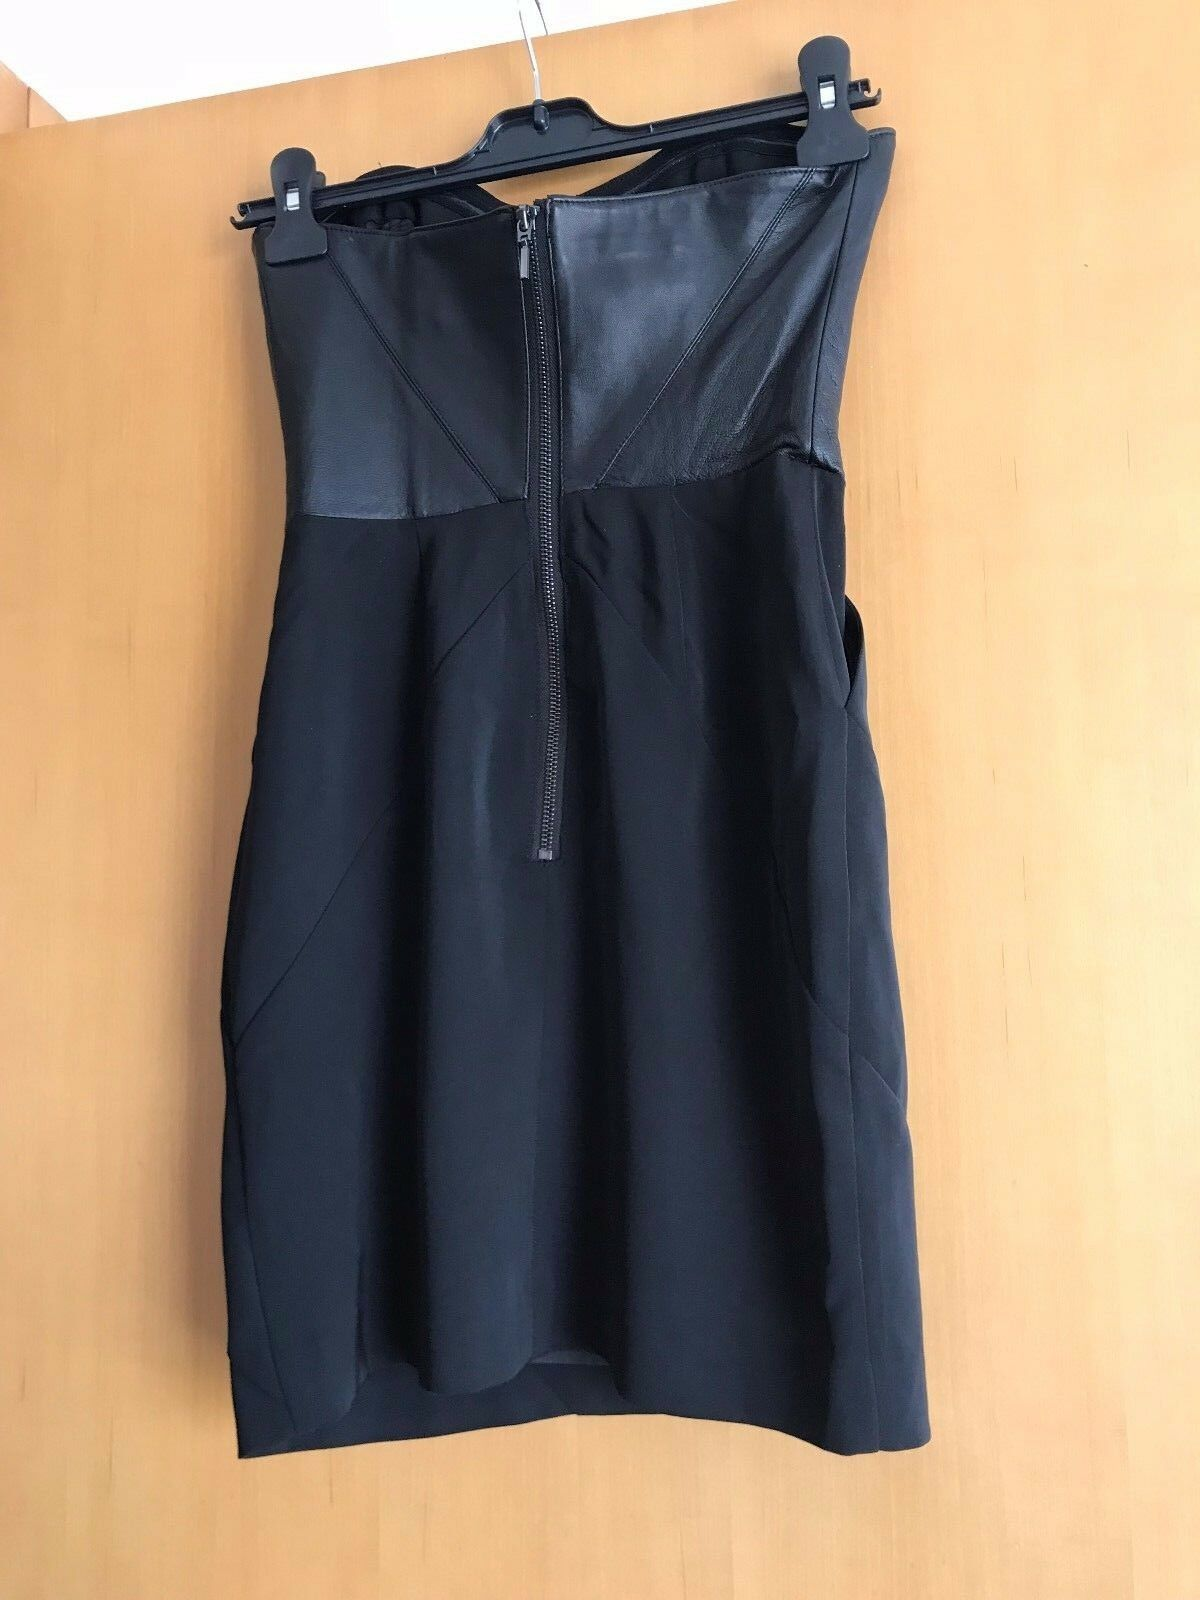 BEBE Strapless  Leather Bustier Pencil Wiggle Dress Größe